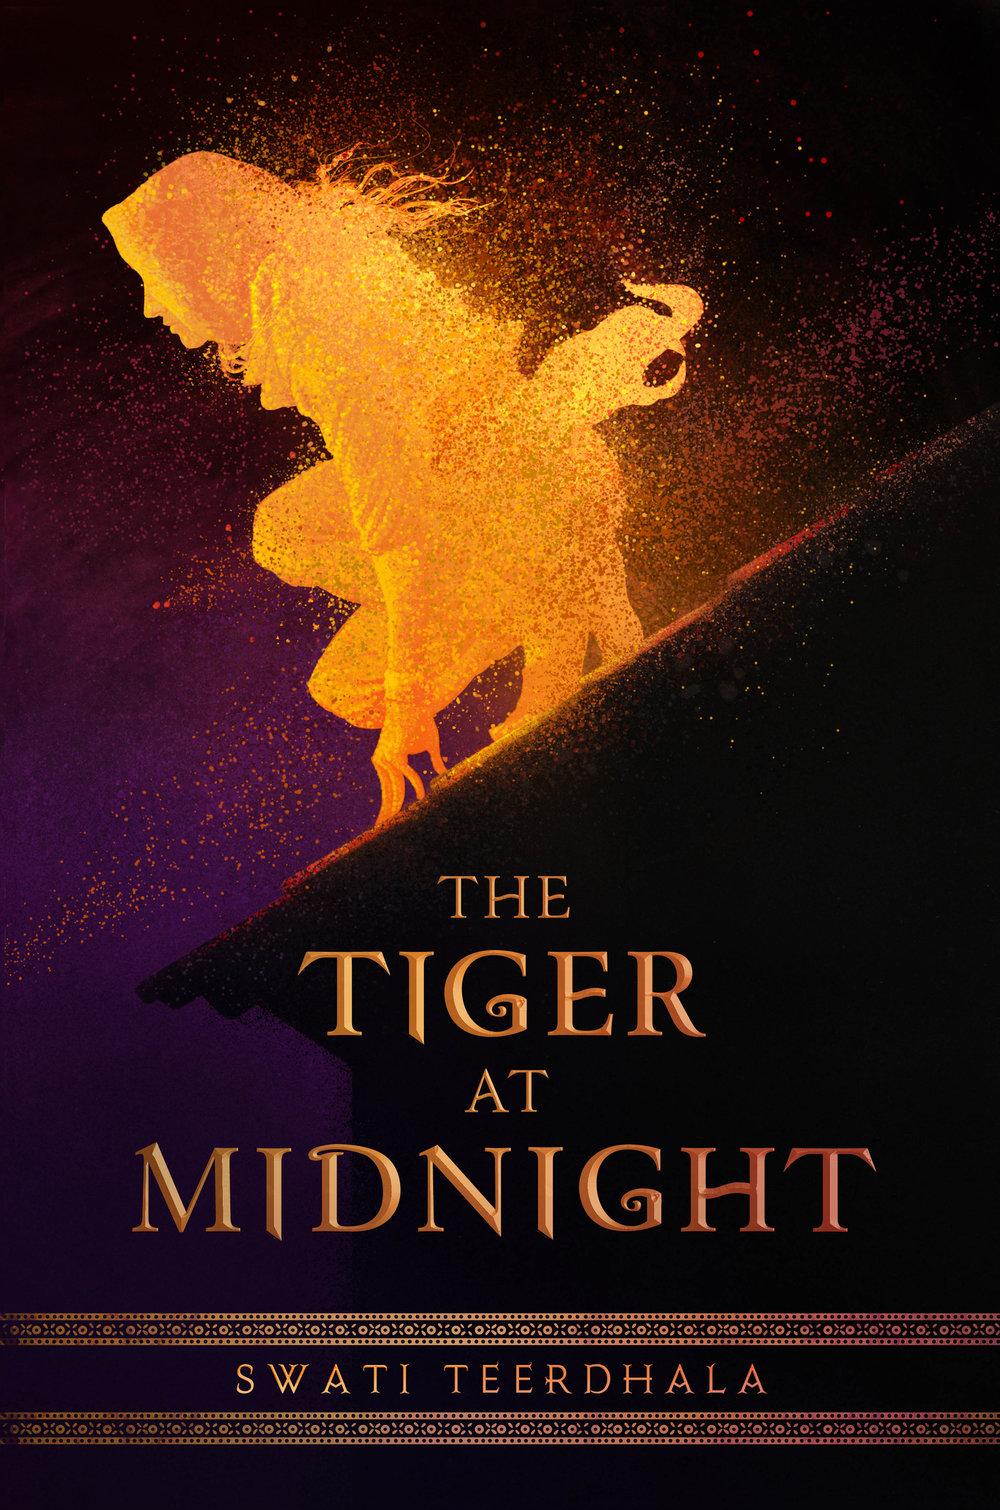 Tigeratmidnight_COMP_140.jpg